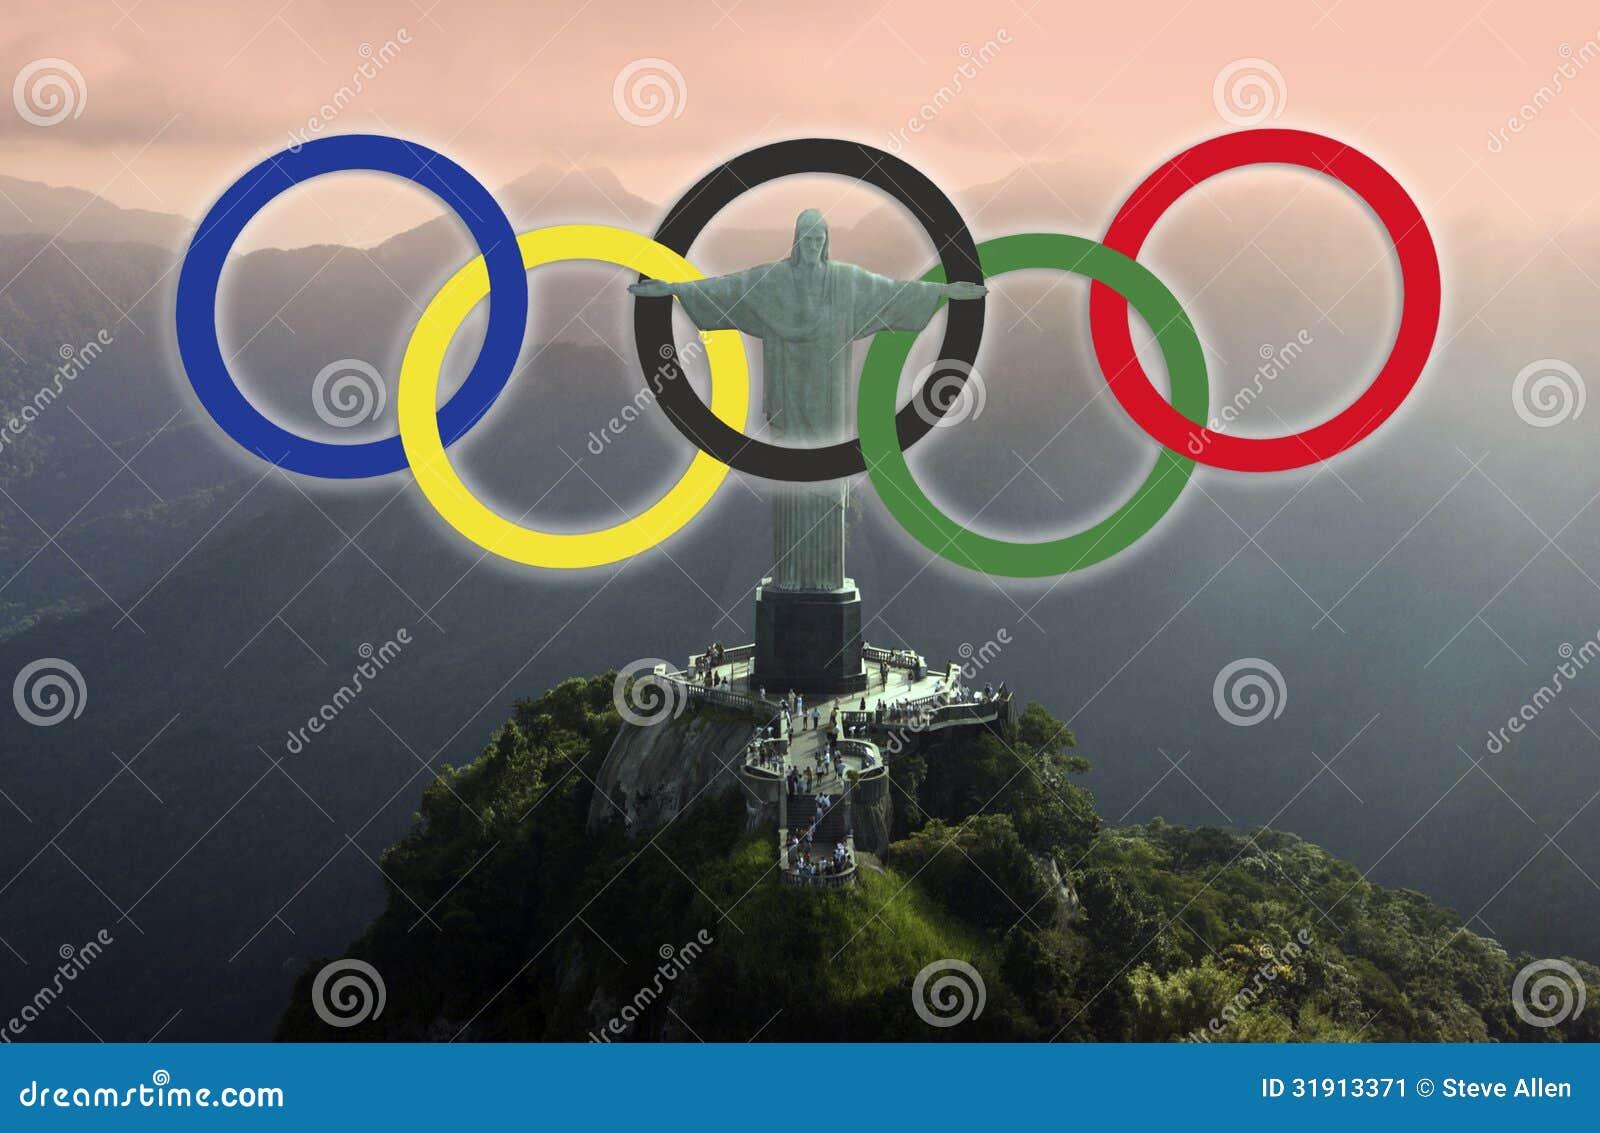 Olympics Rings Rio De Janeiro